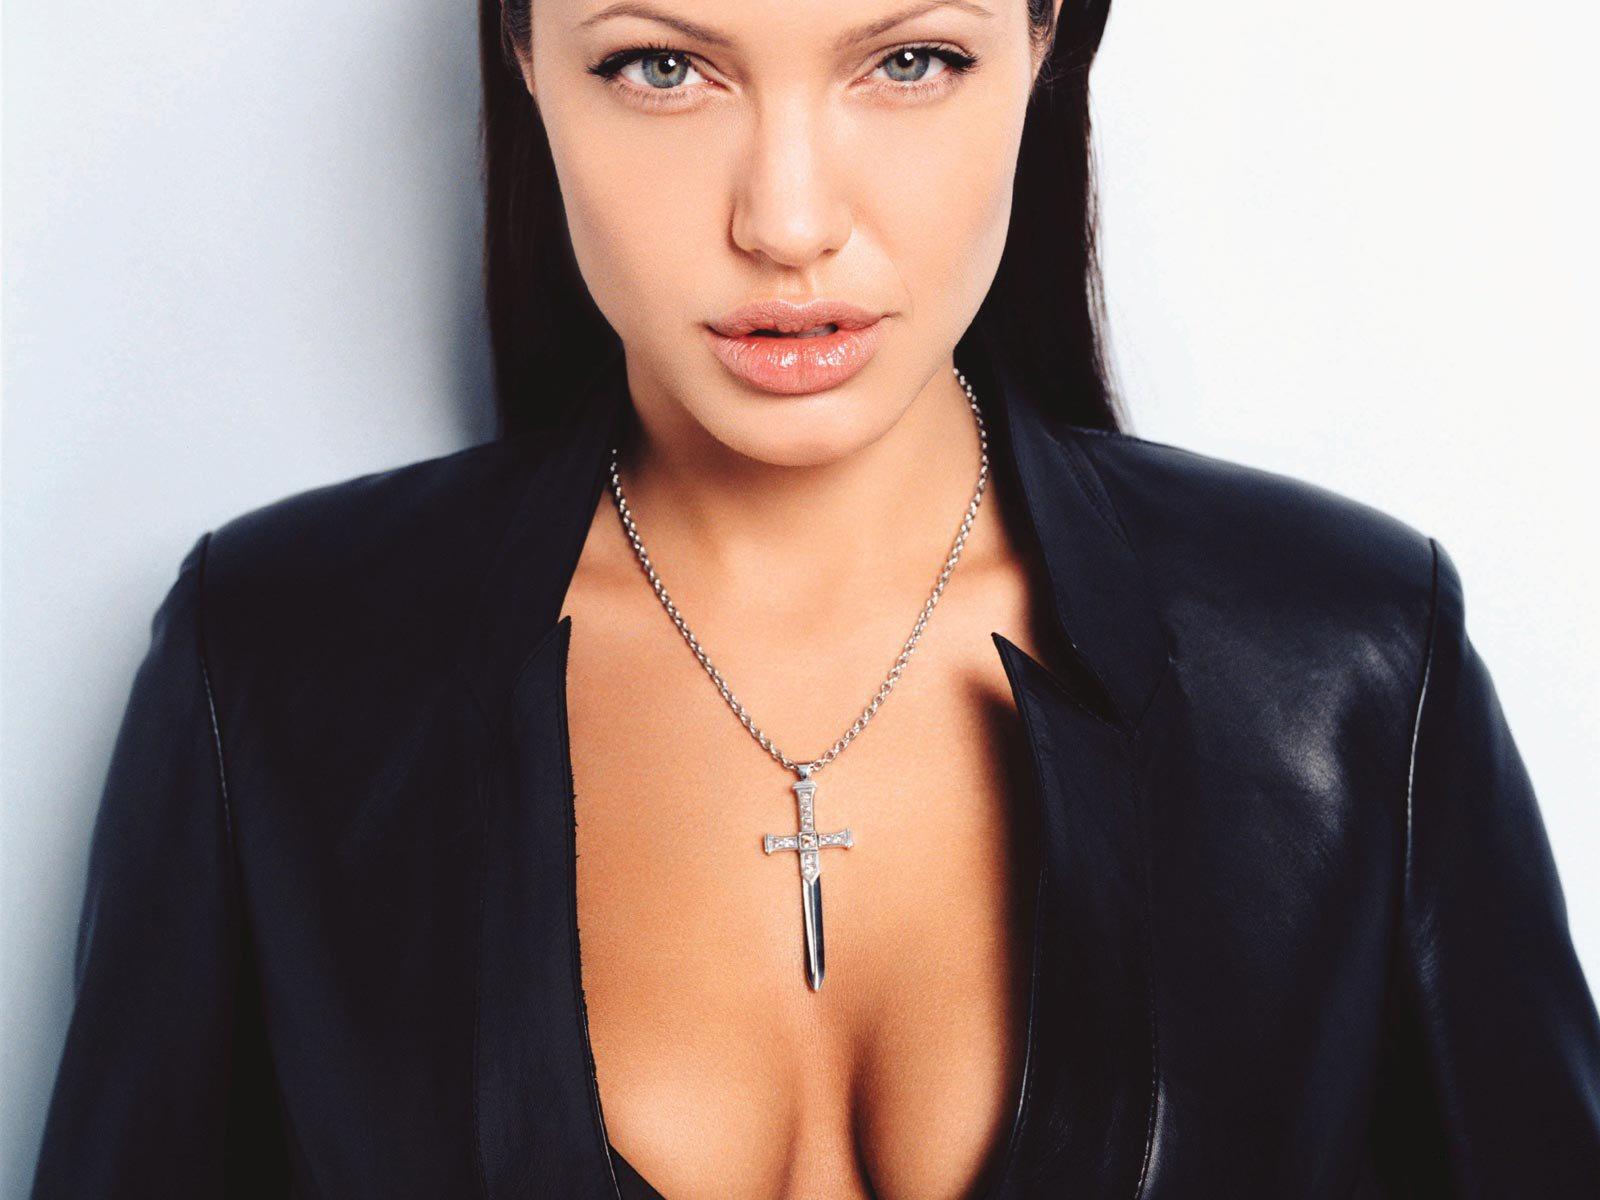 http://2.bp.blogspot.com/_VIa4R7c3Y7o/Swv1CODkLNI/AAAAAAAABY4/z0YNHTCAEkA/s1600/Angelina+Jolie+037.jpg